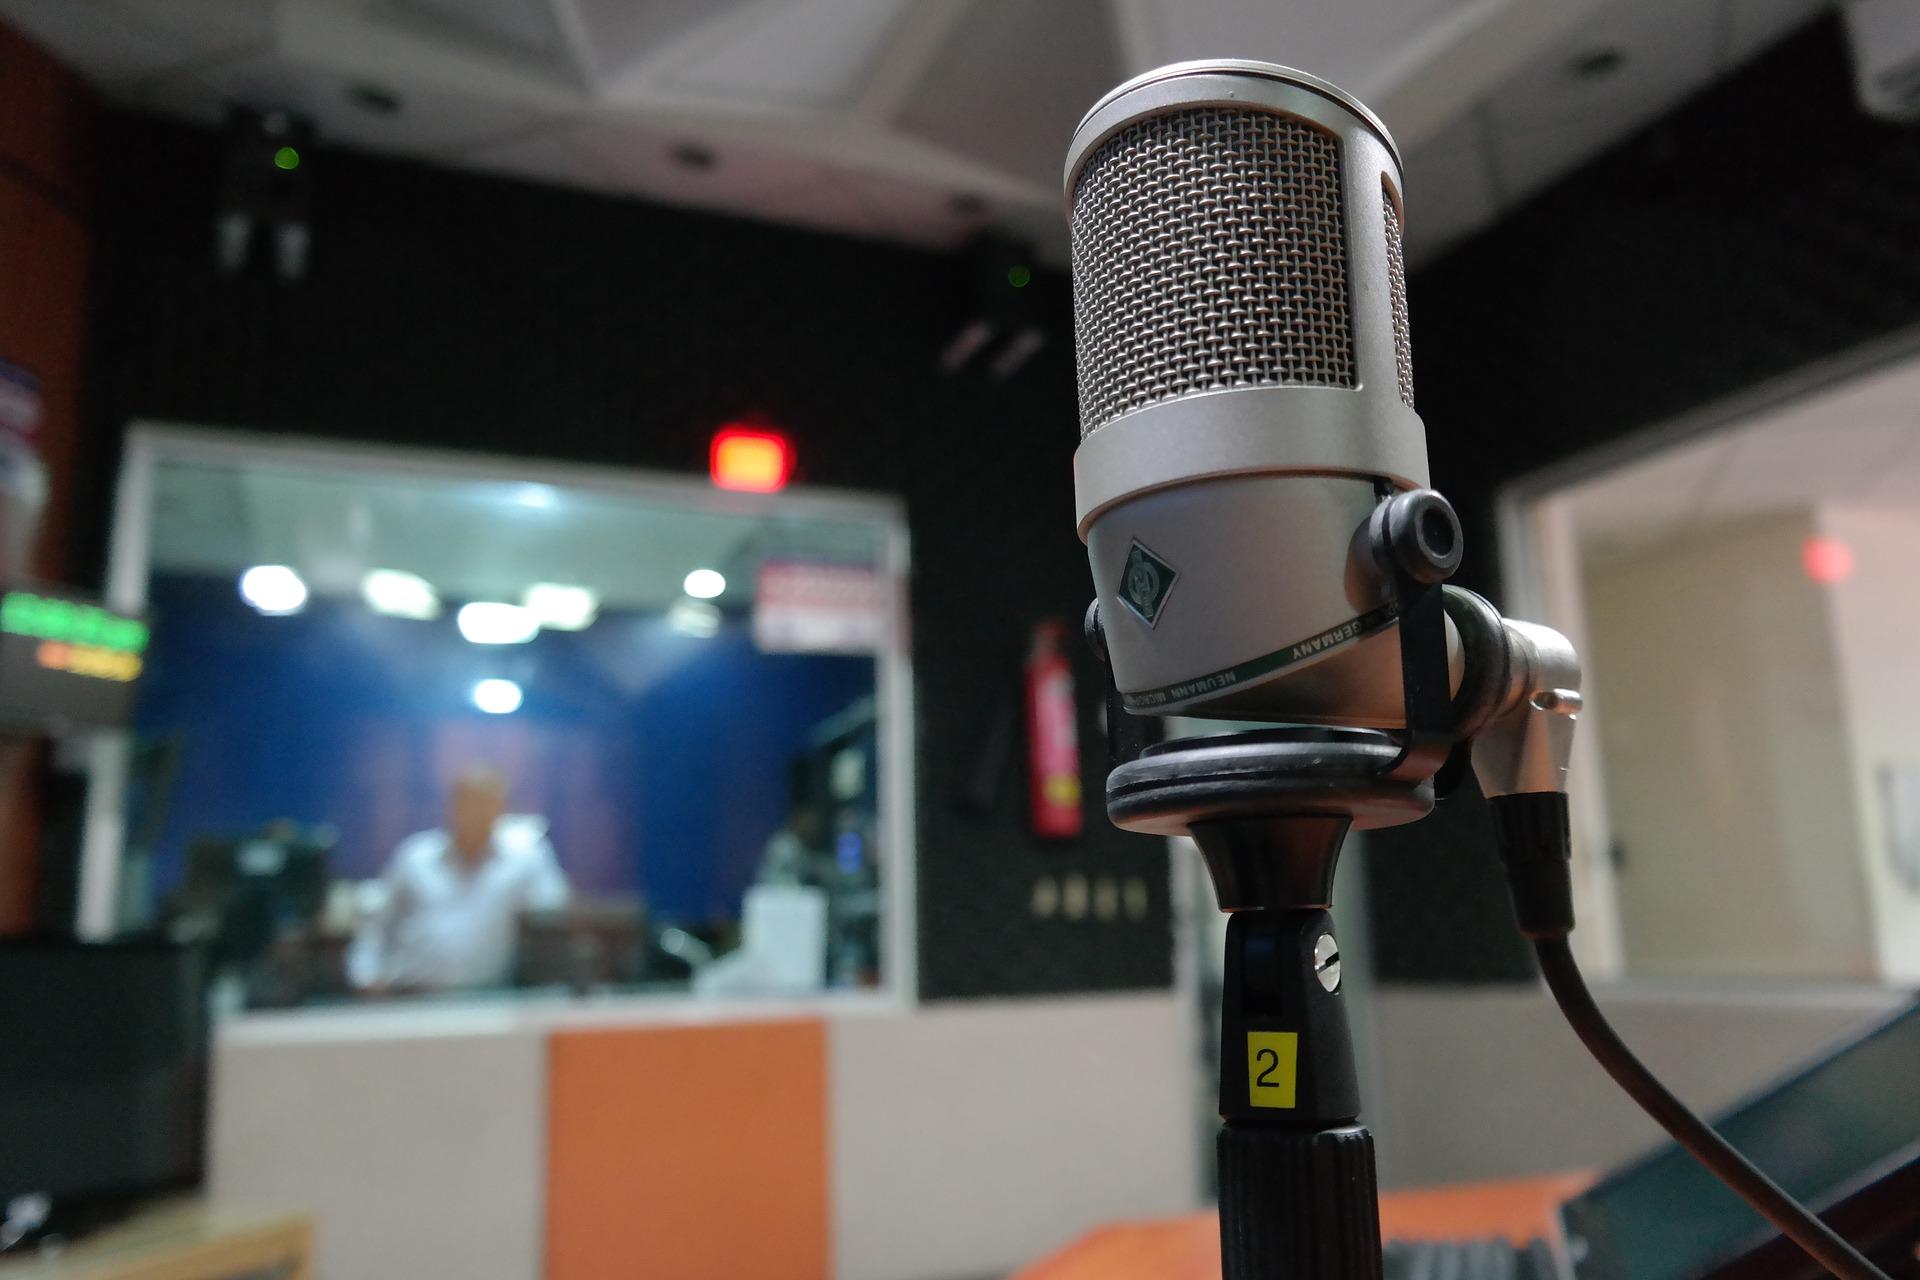 Klubrádió's Case: EC Voices Concern Over Hungarian Media Pluralism